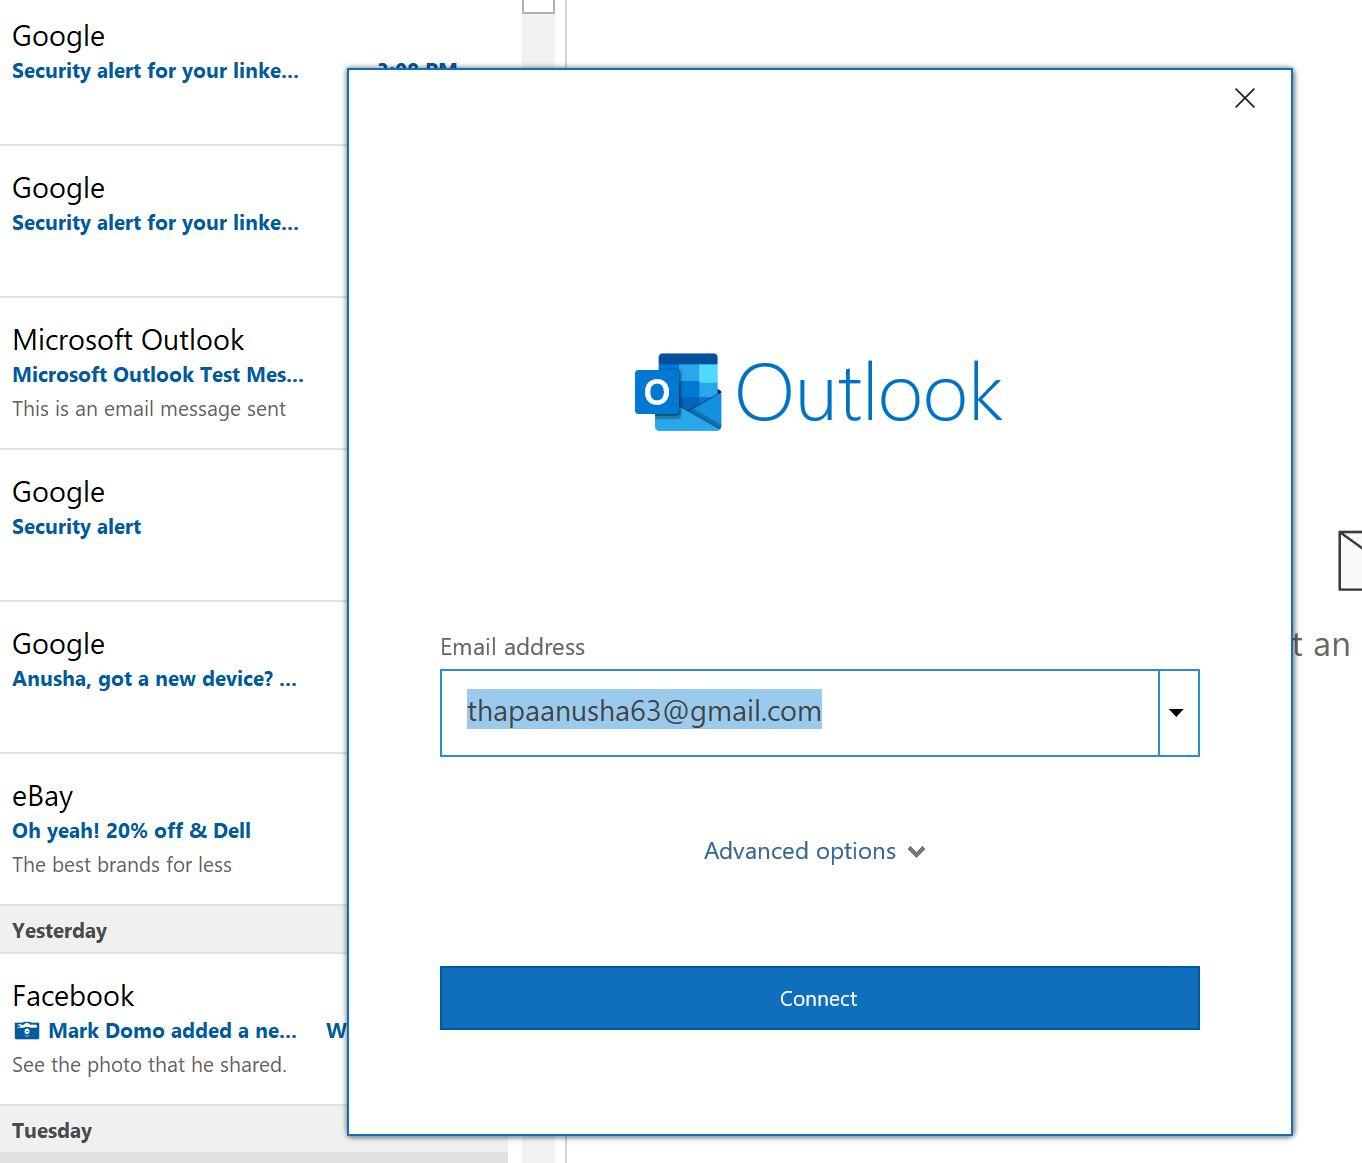 Adding new gmail